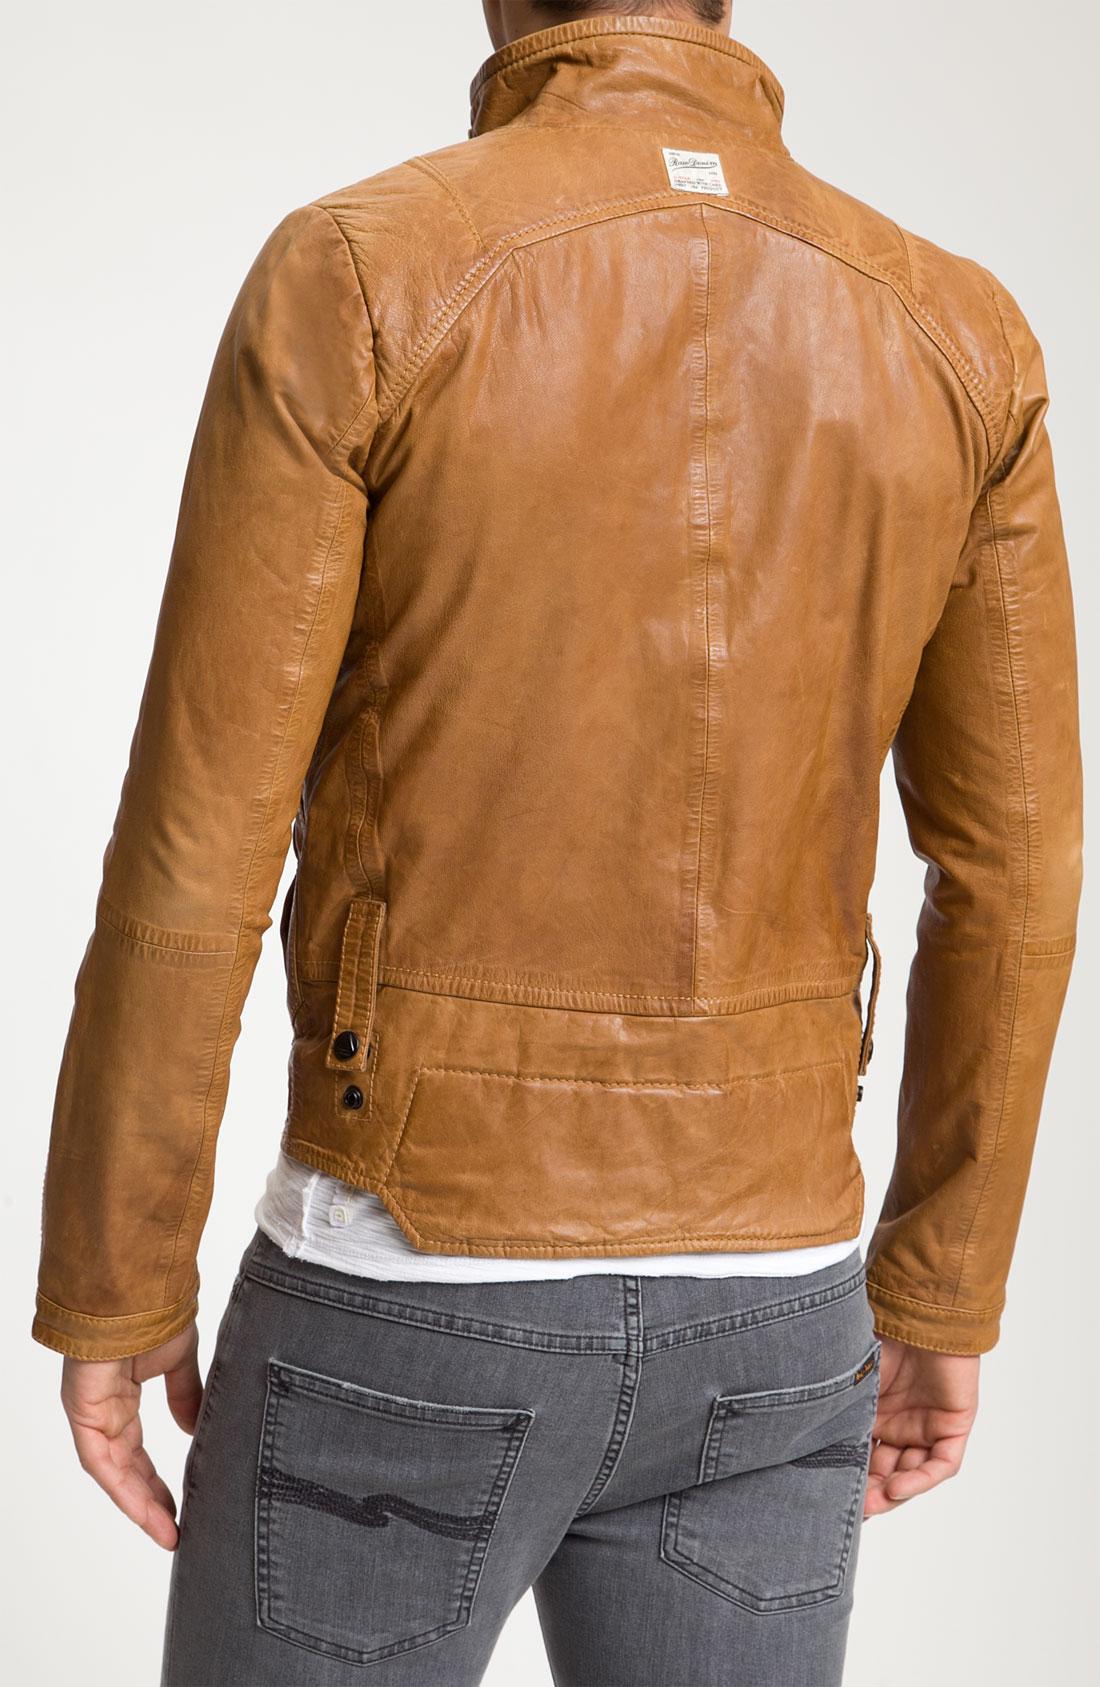 g star raw g star leather jacket in brown for men lyst. Black Bedroom Furniture Sets. Home Design Ideas